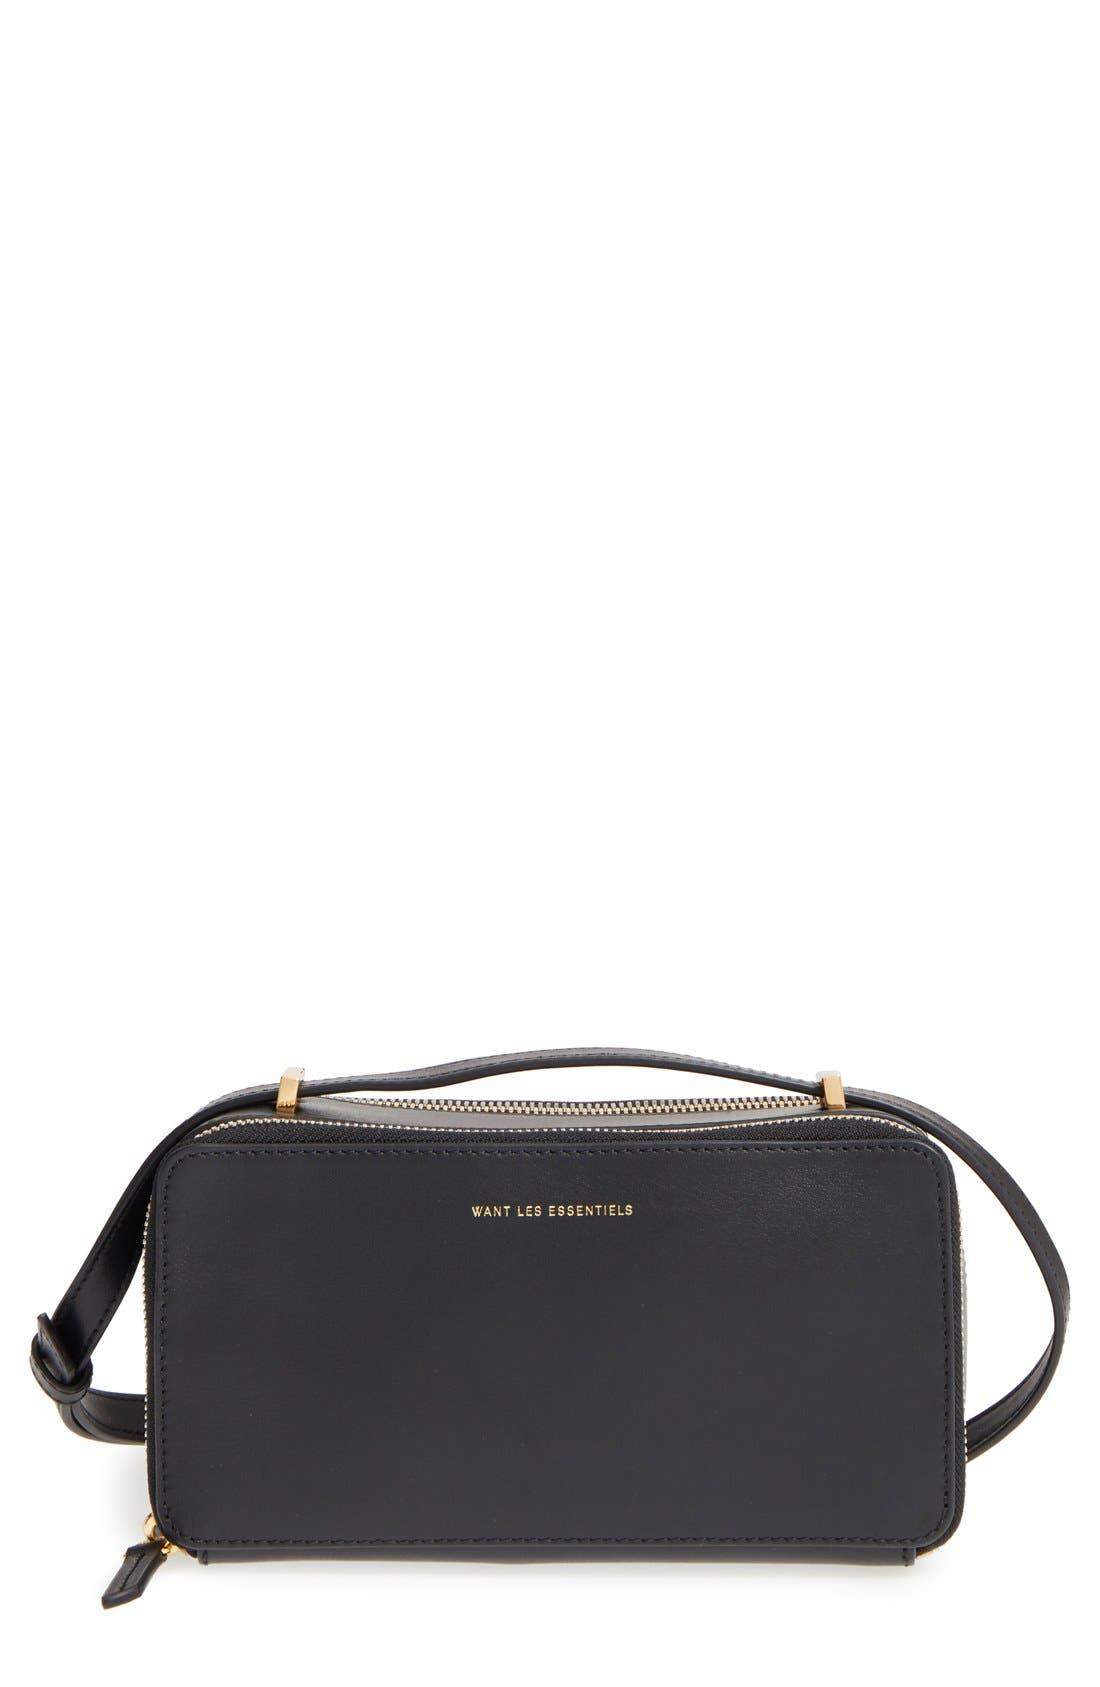 WANT LES ESSENTIELS 'Demiranda' Leather Shoulder Bag, Main, color, 001